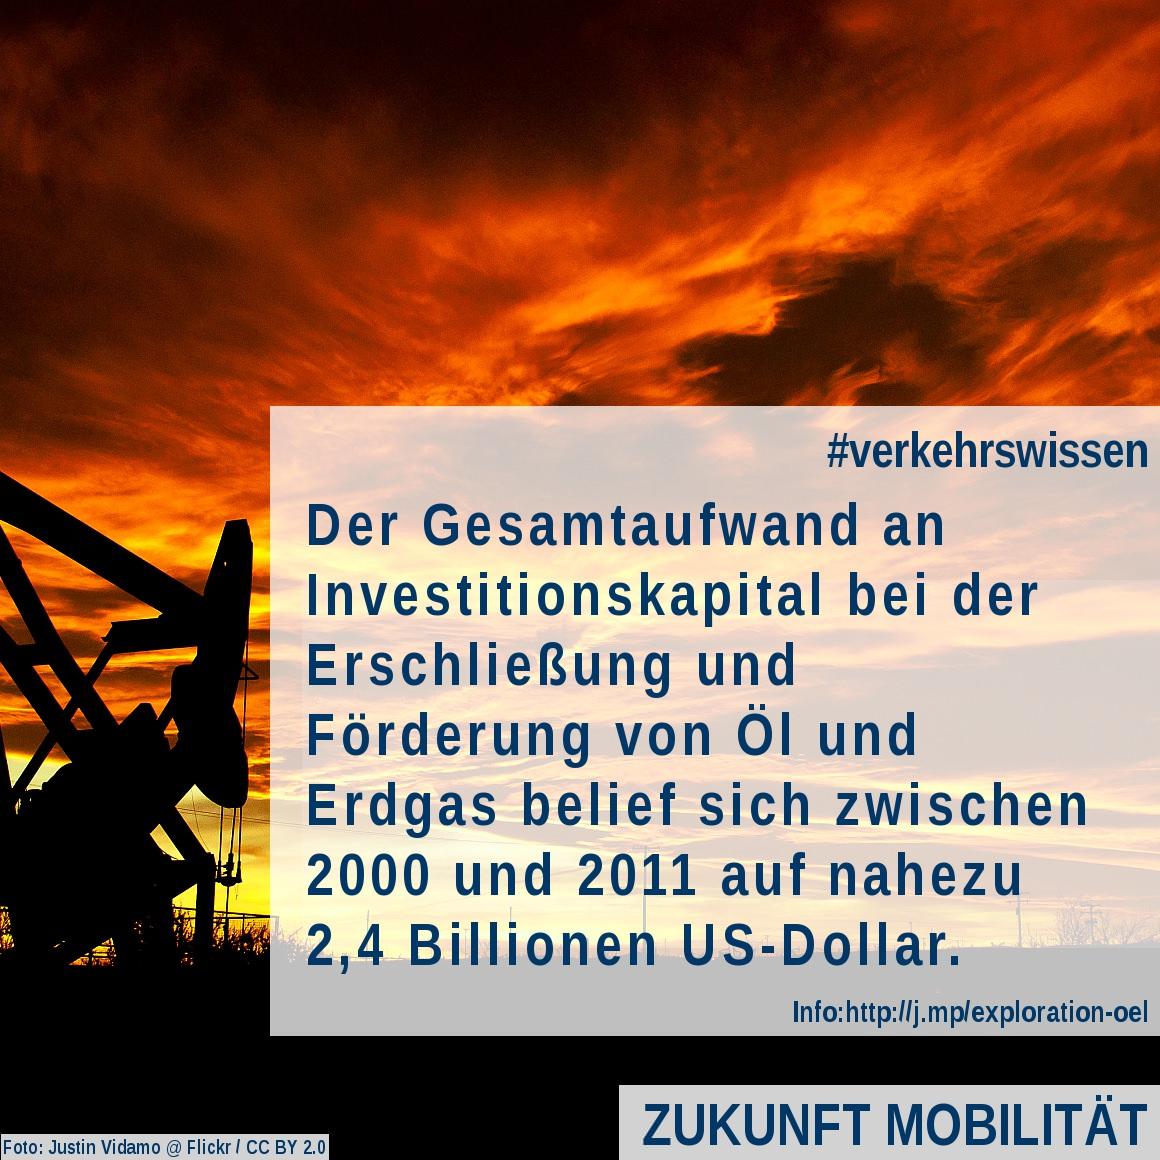 kosten-exploration-erdoel-erdgas-fossile-energietraeger-kraftstoffe-2000-2011